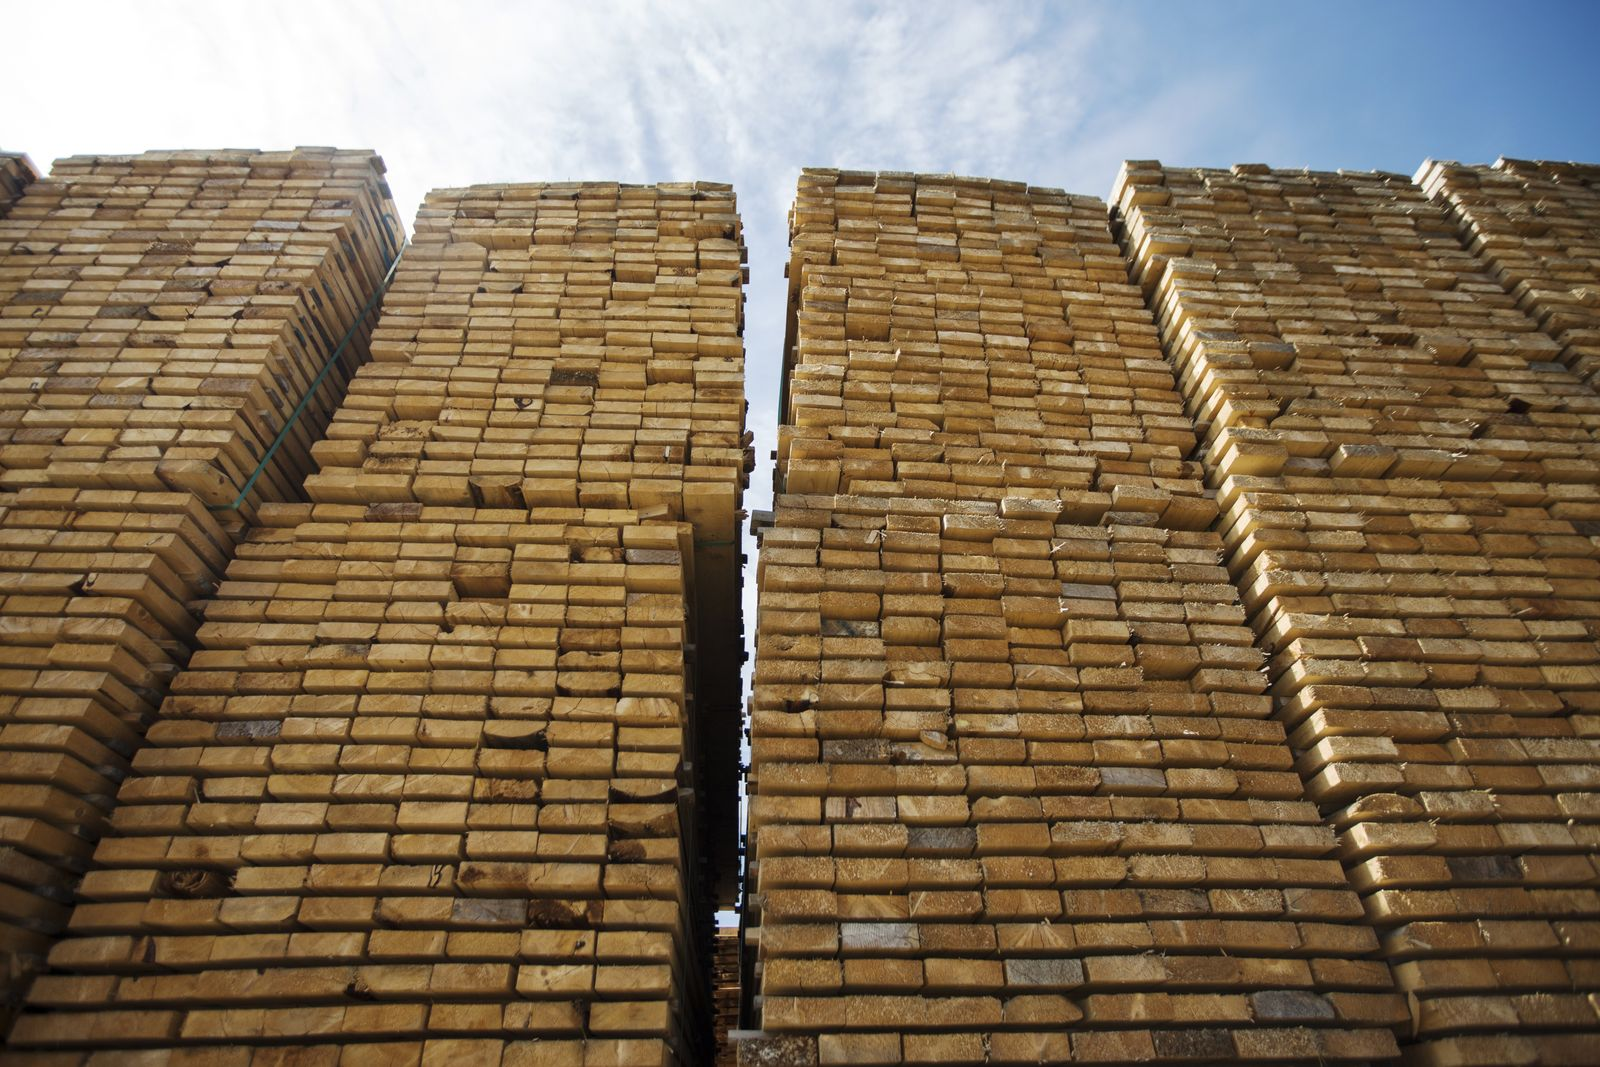 Large Stacks Of Cut Timber